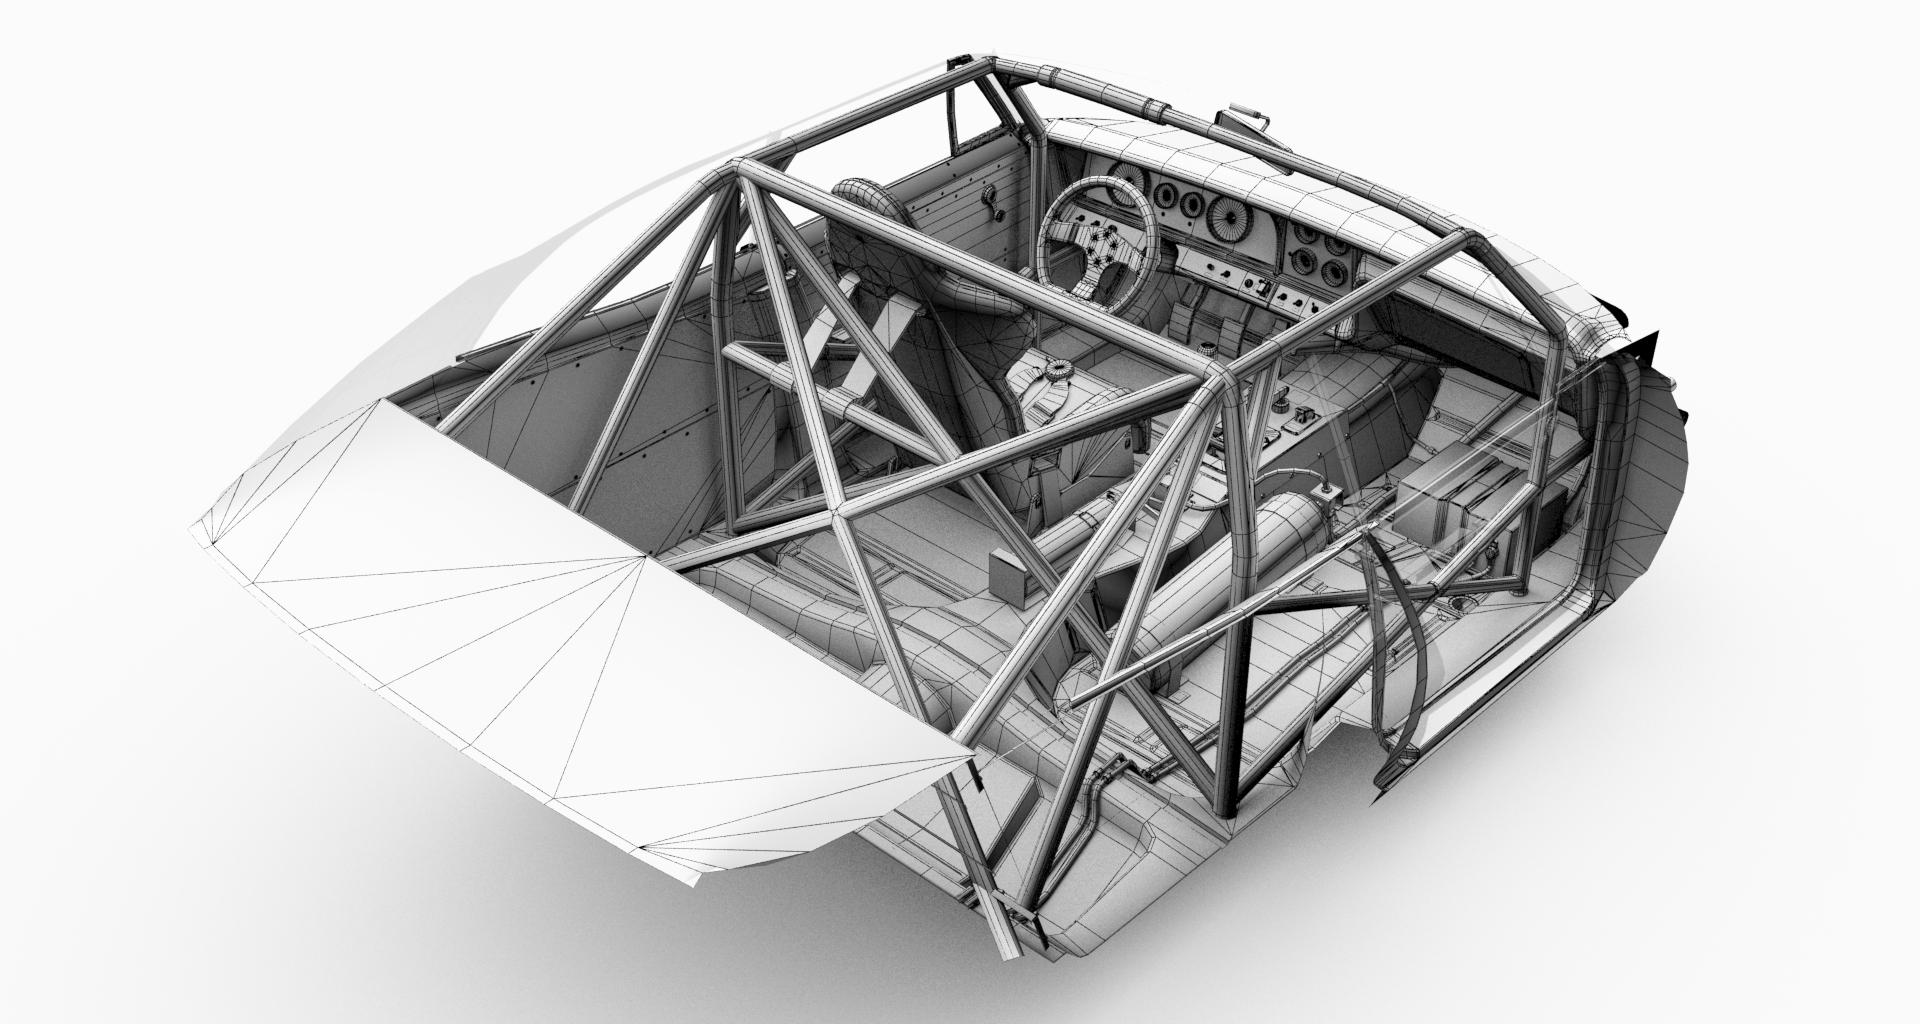 2013-03_The Crew_F.Beudin_Chevrolet Impala-1967-Racing_AO-Cockpit